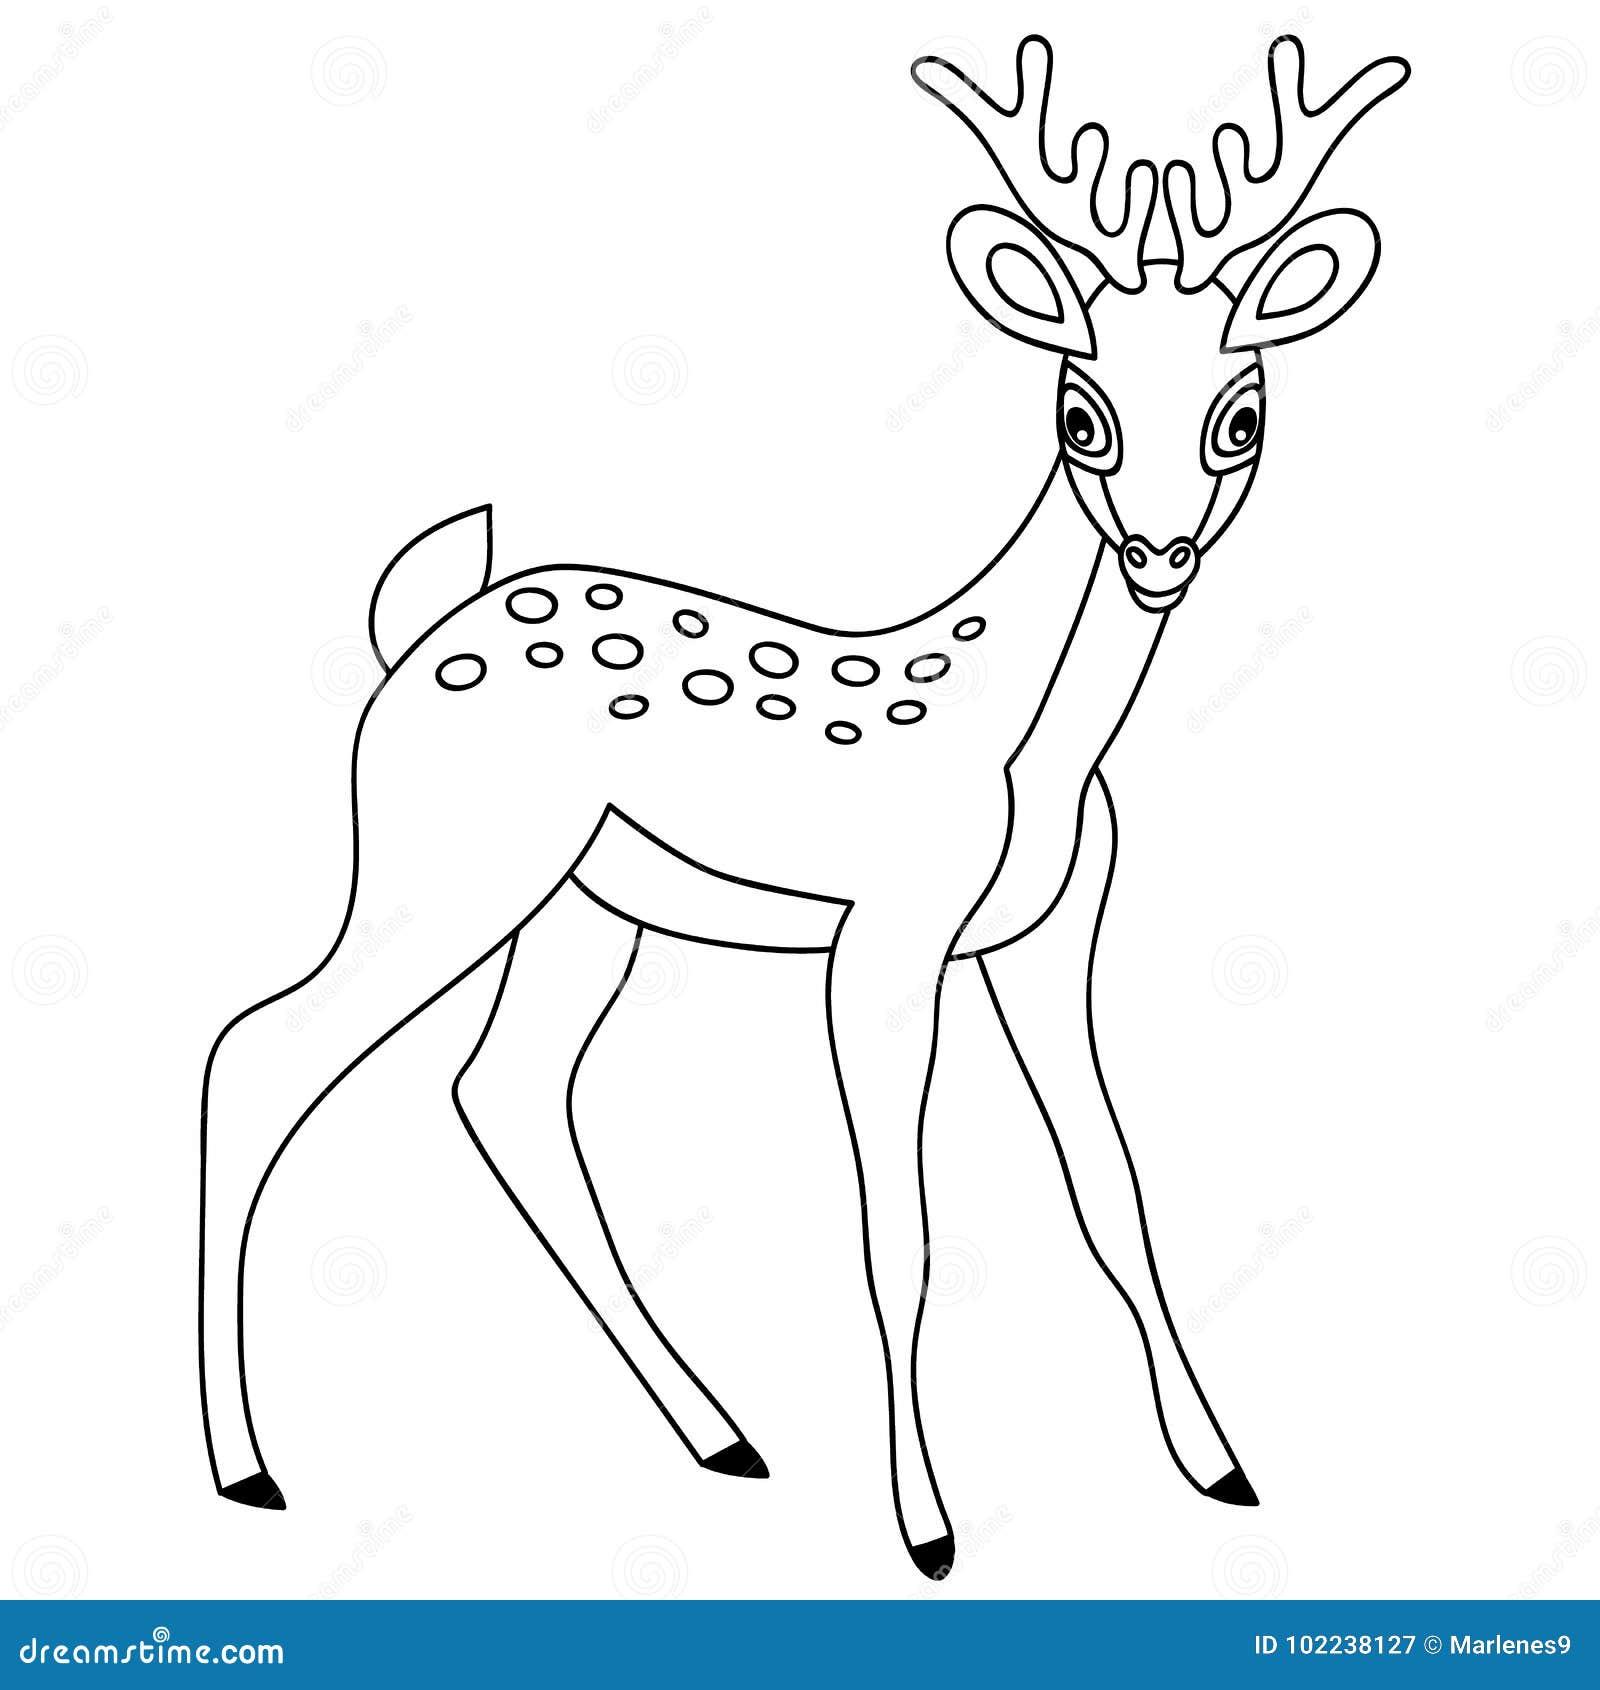 Deer illustration black and white - photo#42